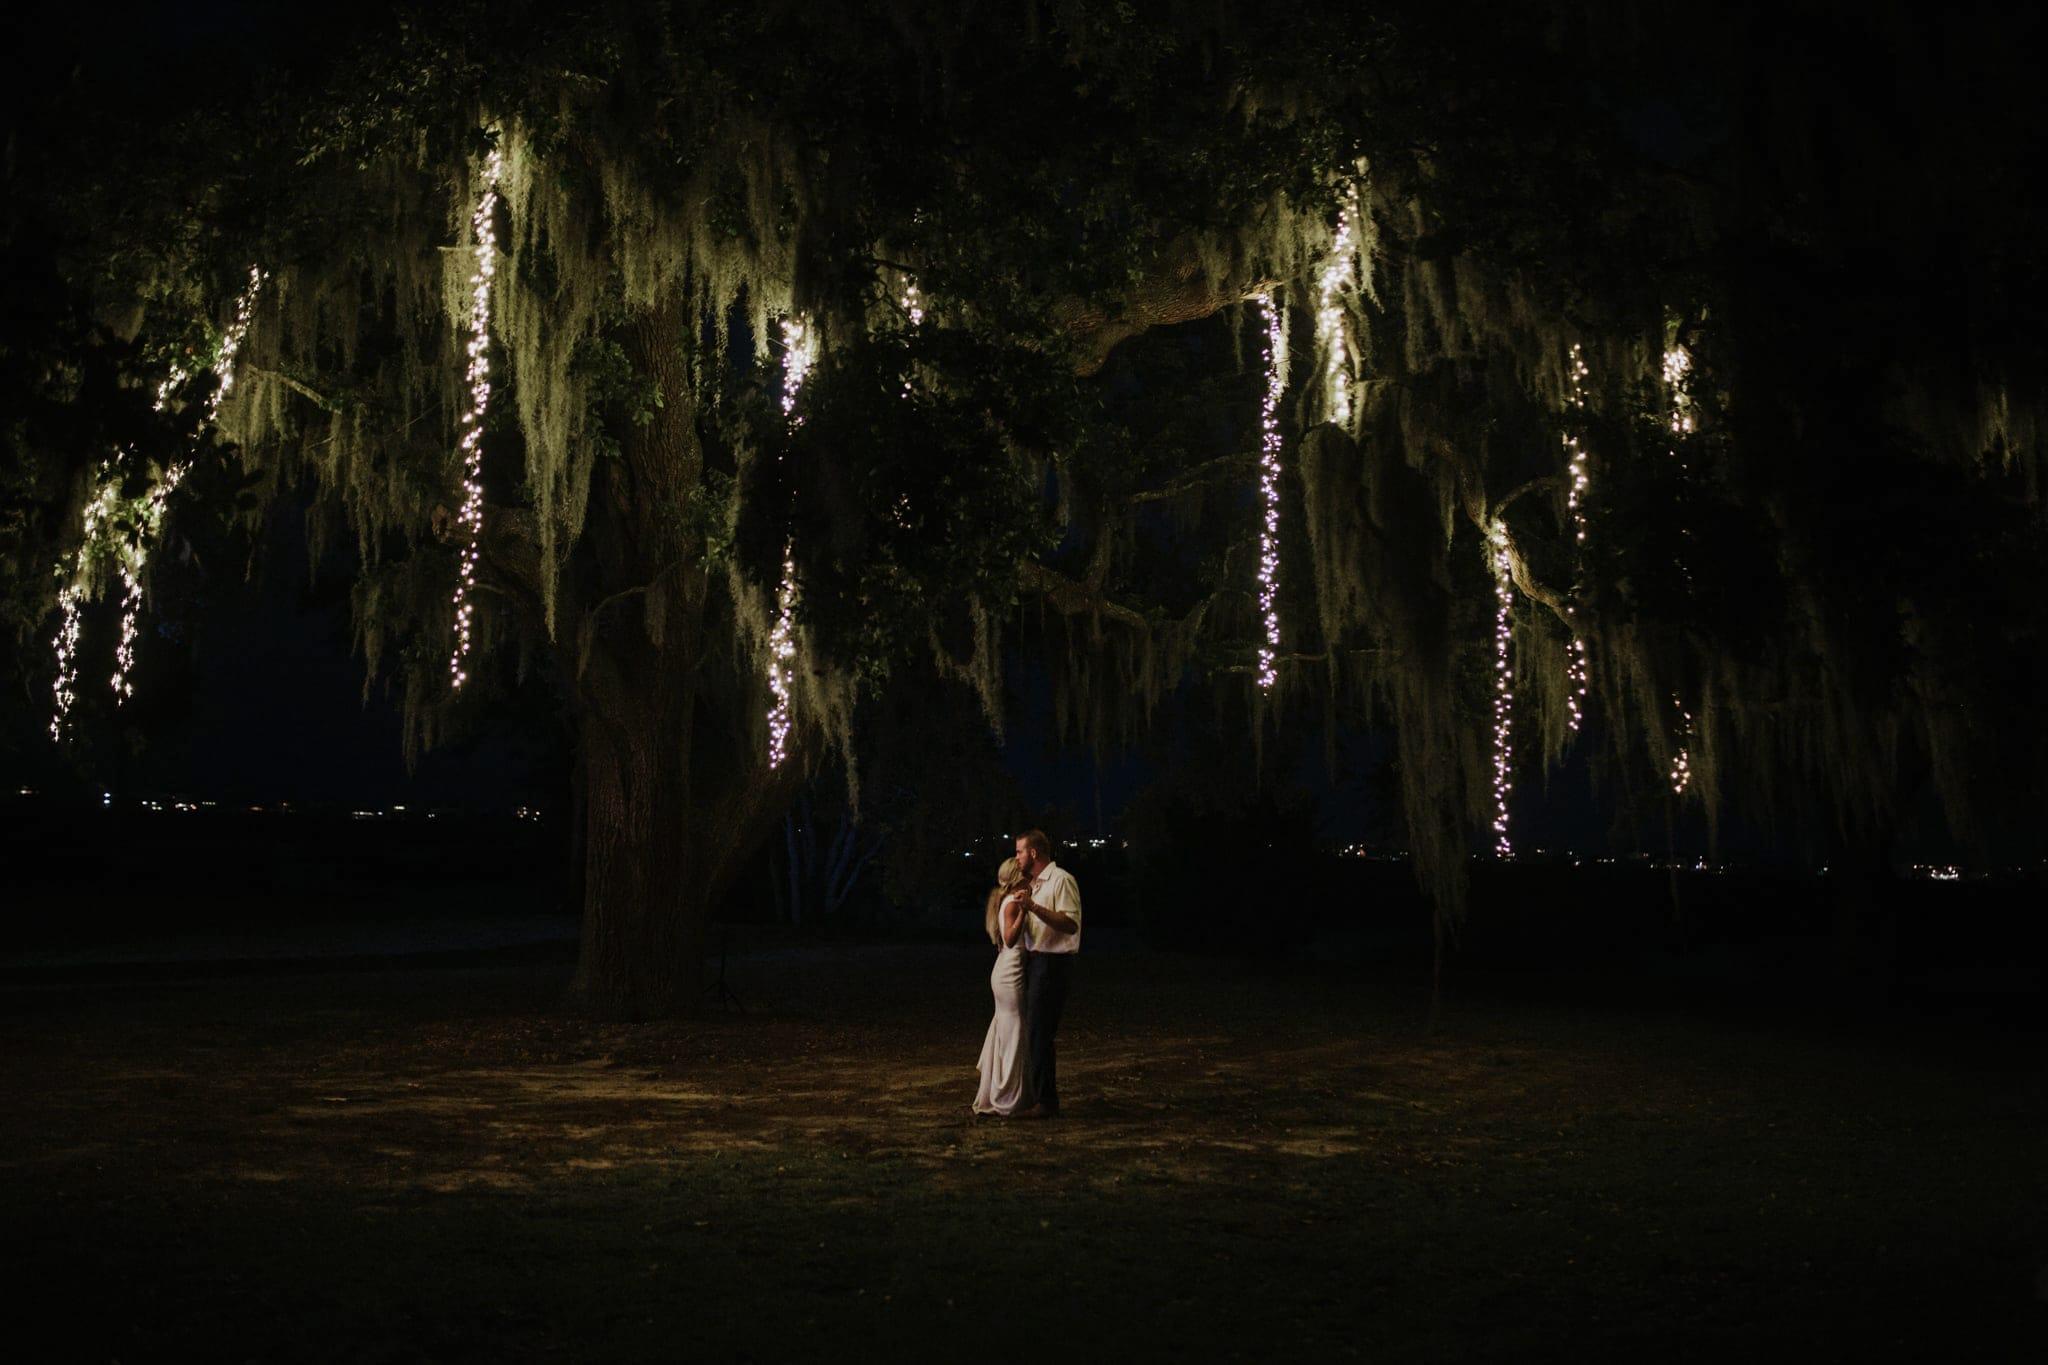 Sunnyside-plantation-murrels-inlet-sc-wedding_21.jpg